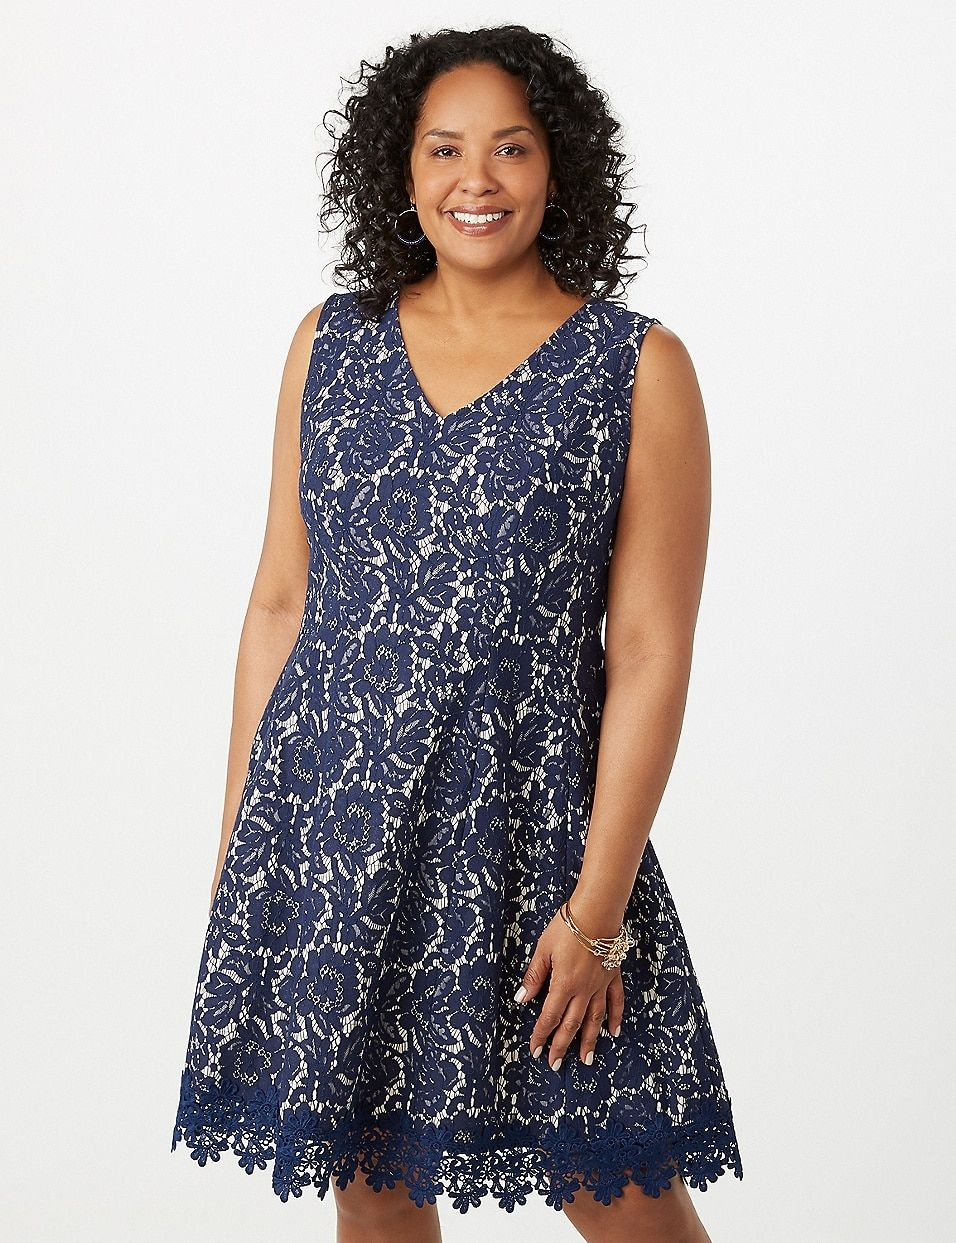 Plus Size Lace CrochetHem Dress dressbarn Plus size